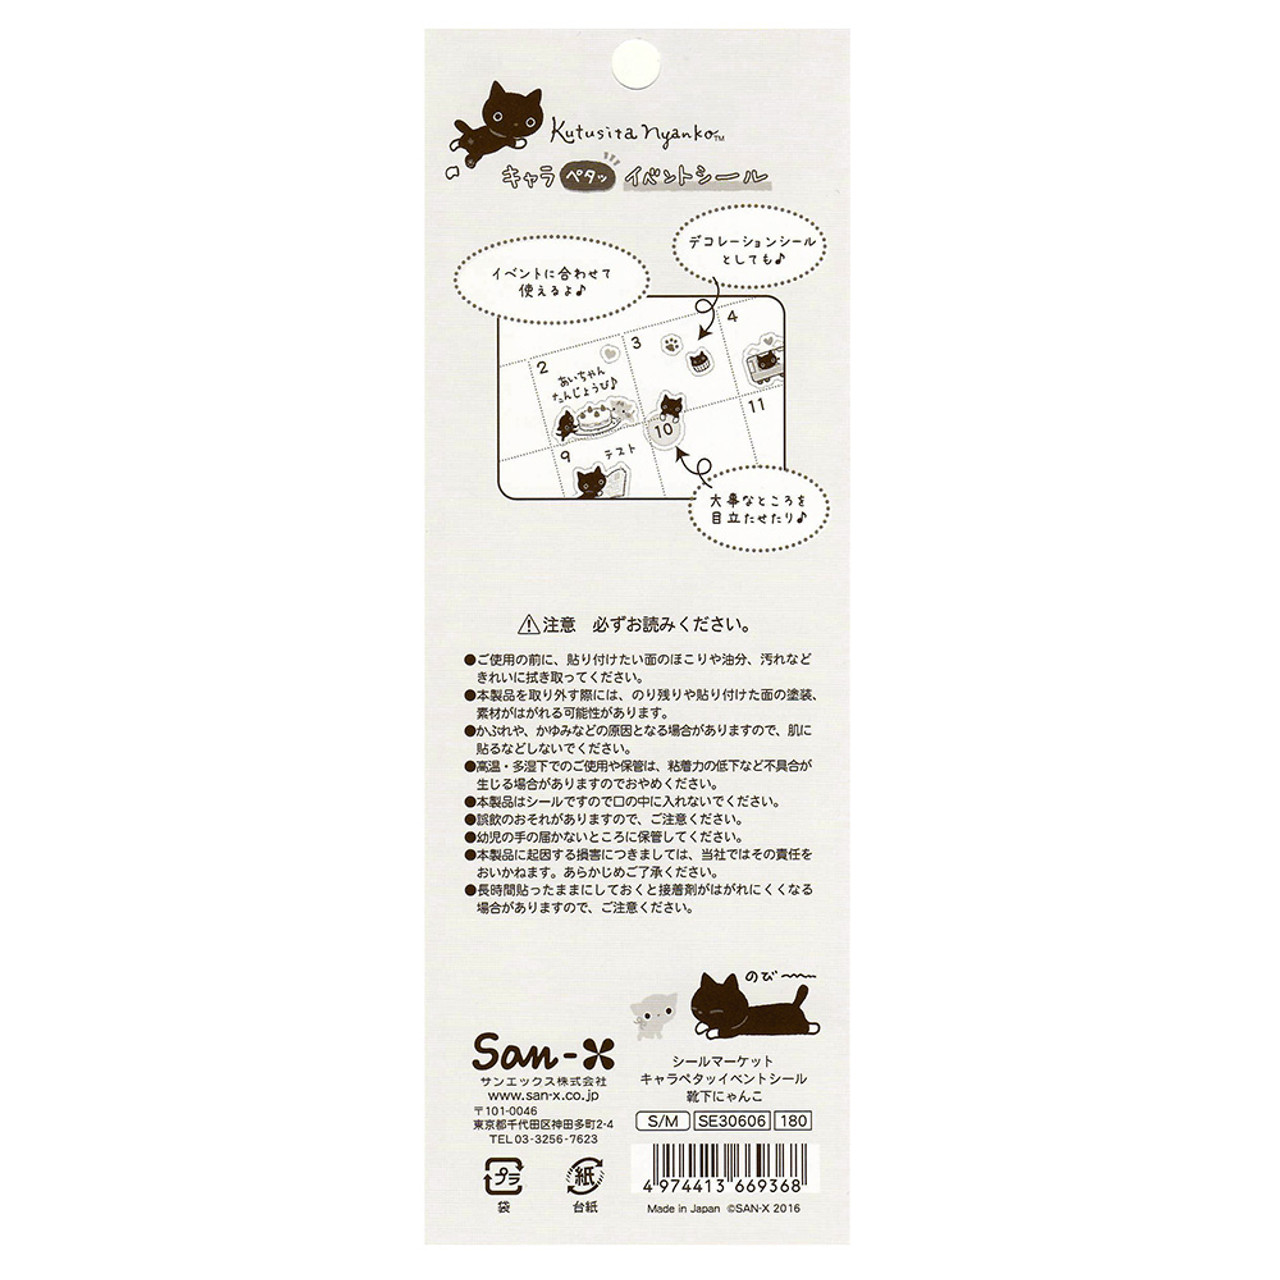 San-X Kutusita Nyanko Socks Black Cat Events Schedule Sticker SE30606 ( Black View )